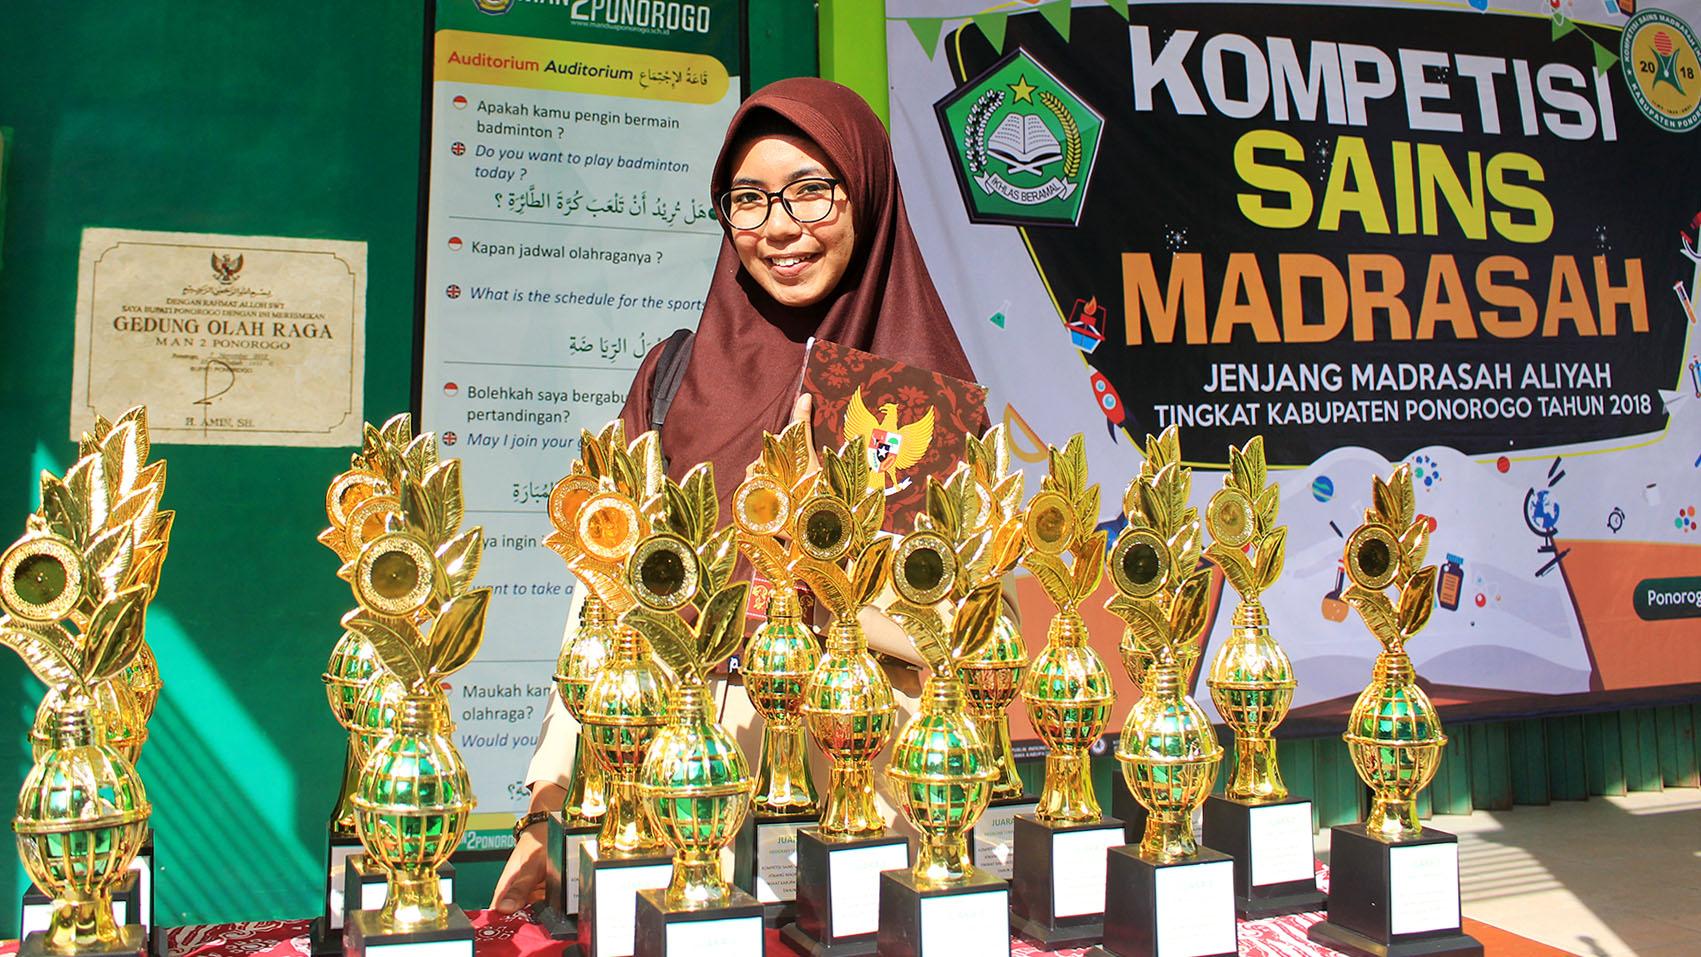 Perolehan Juara dalam KSM Tingkat Kab. Ponorogo